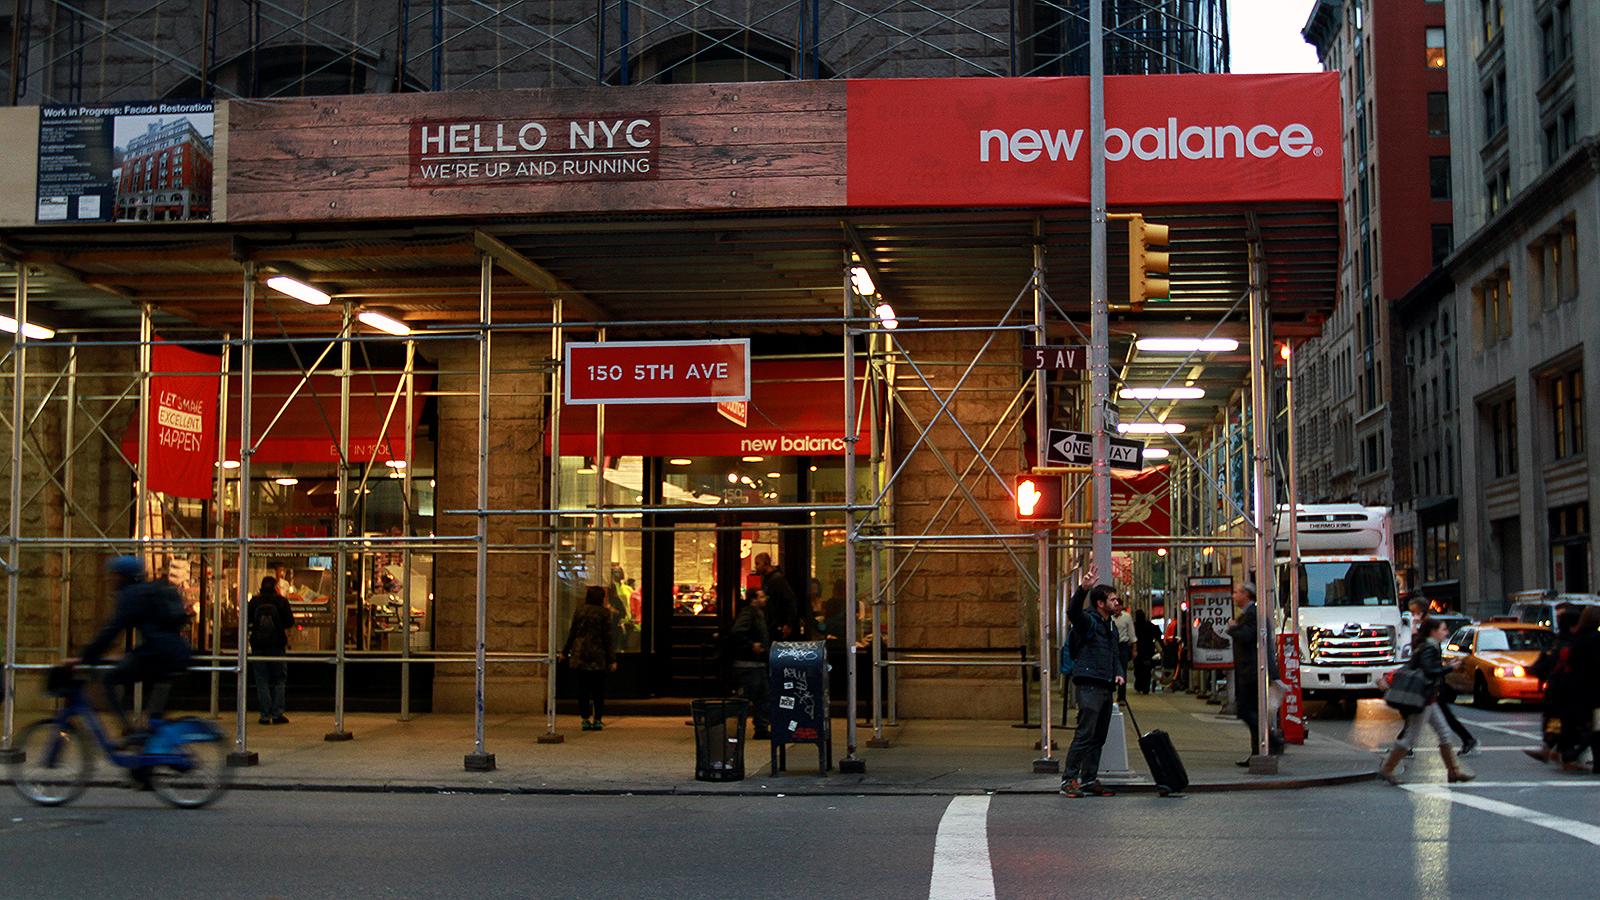 new balance shop in new york city